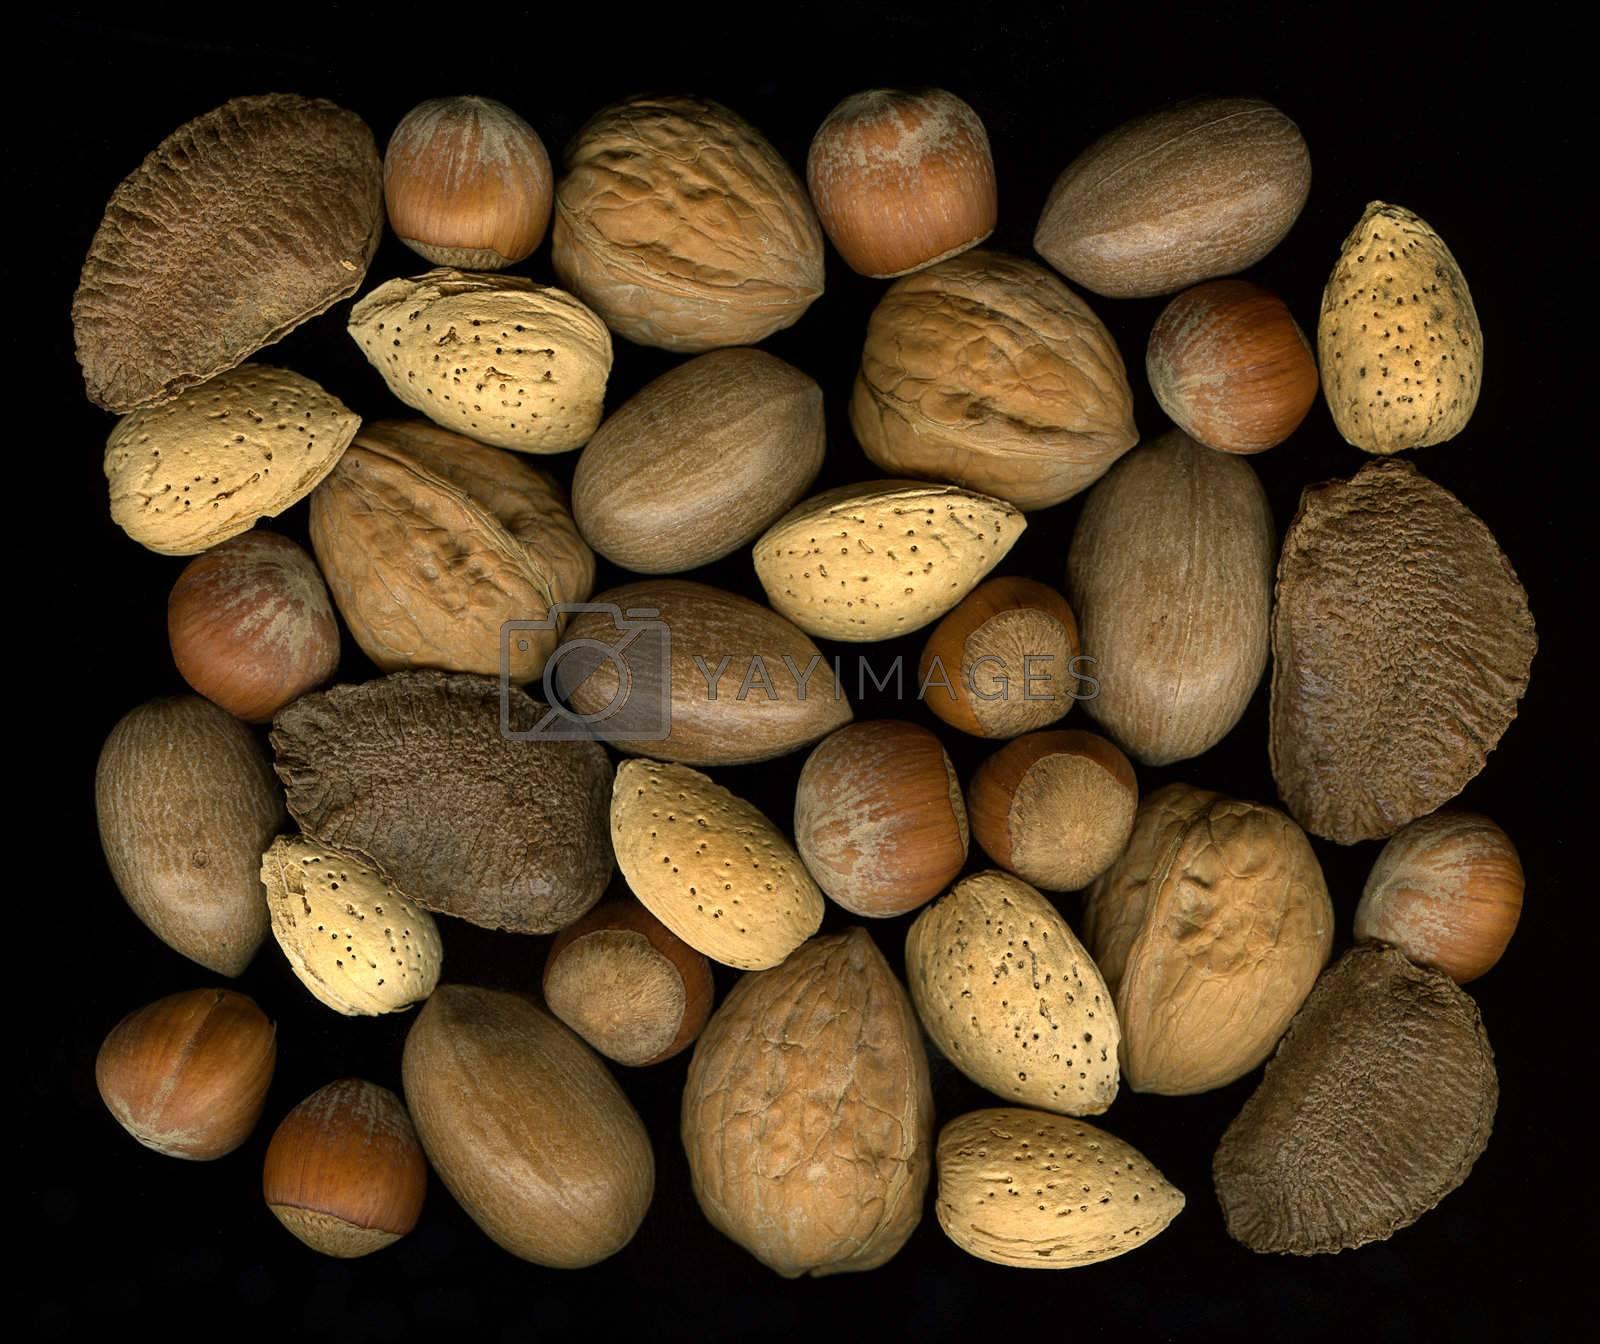 A collection of mix nuts in shells: walnut, hazelnut, pecan, almond, brazil on black background